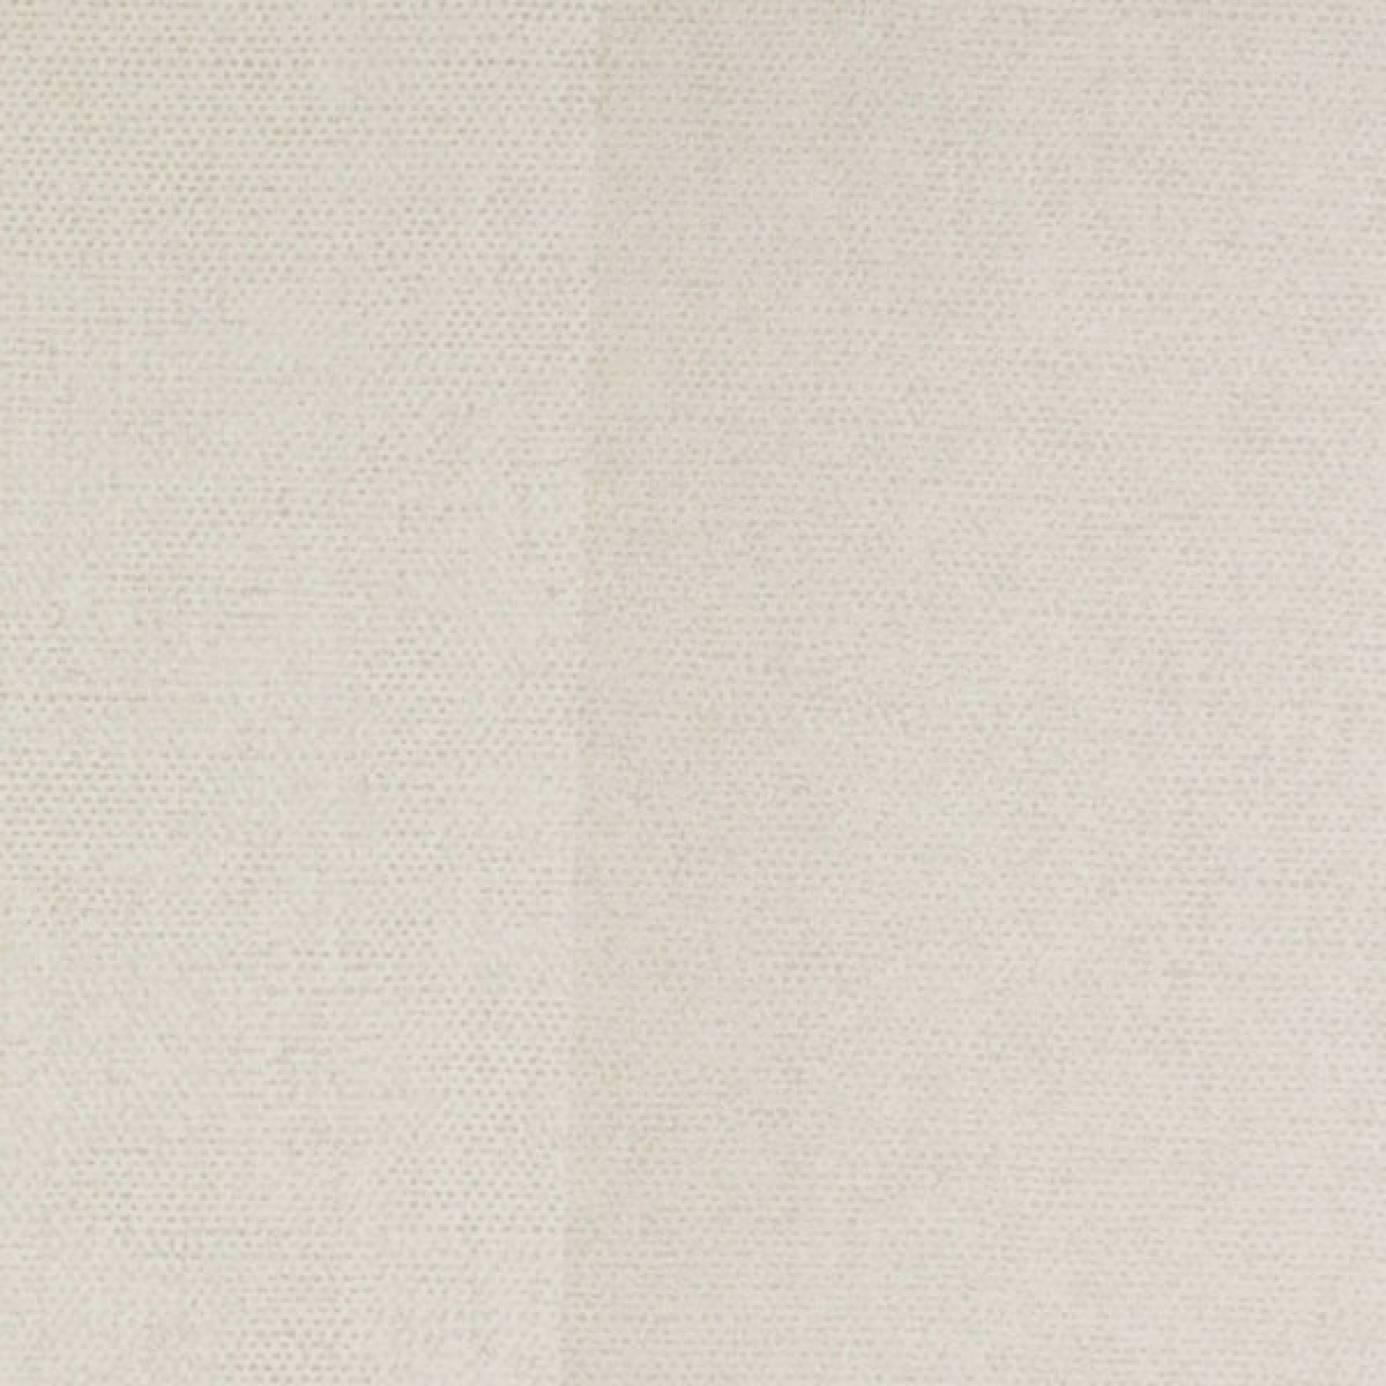 Французские обои Casadeco,  коллекция So White 2, артикулSWI21810115